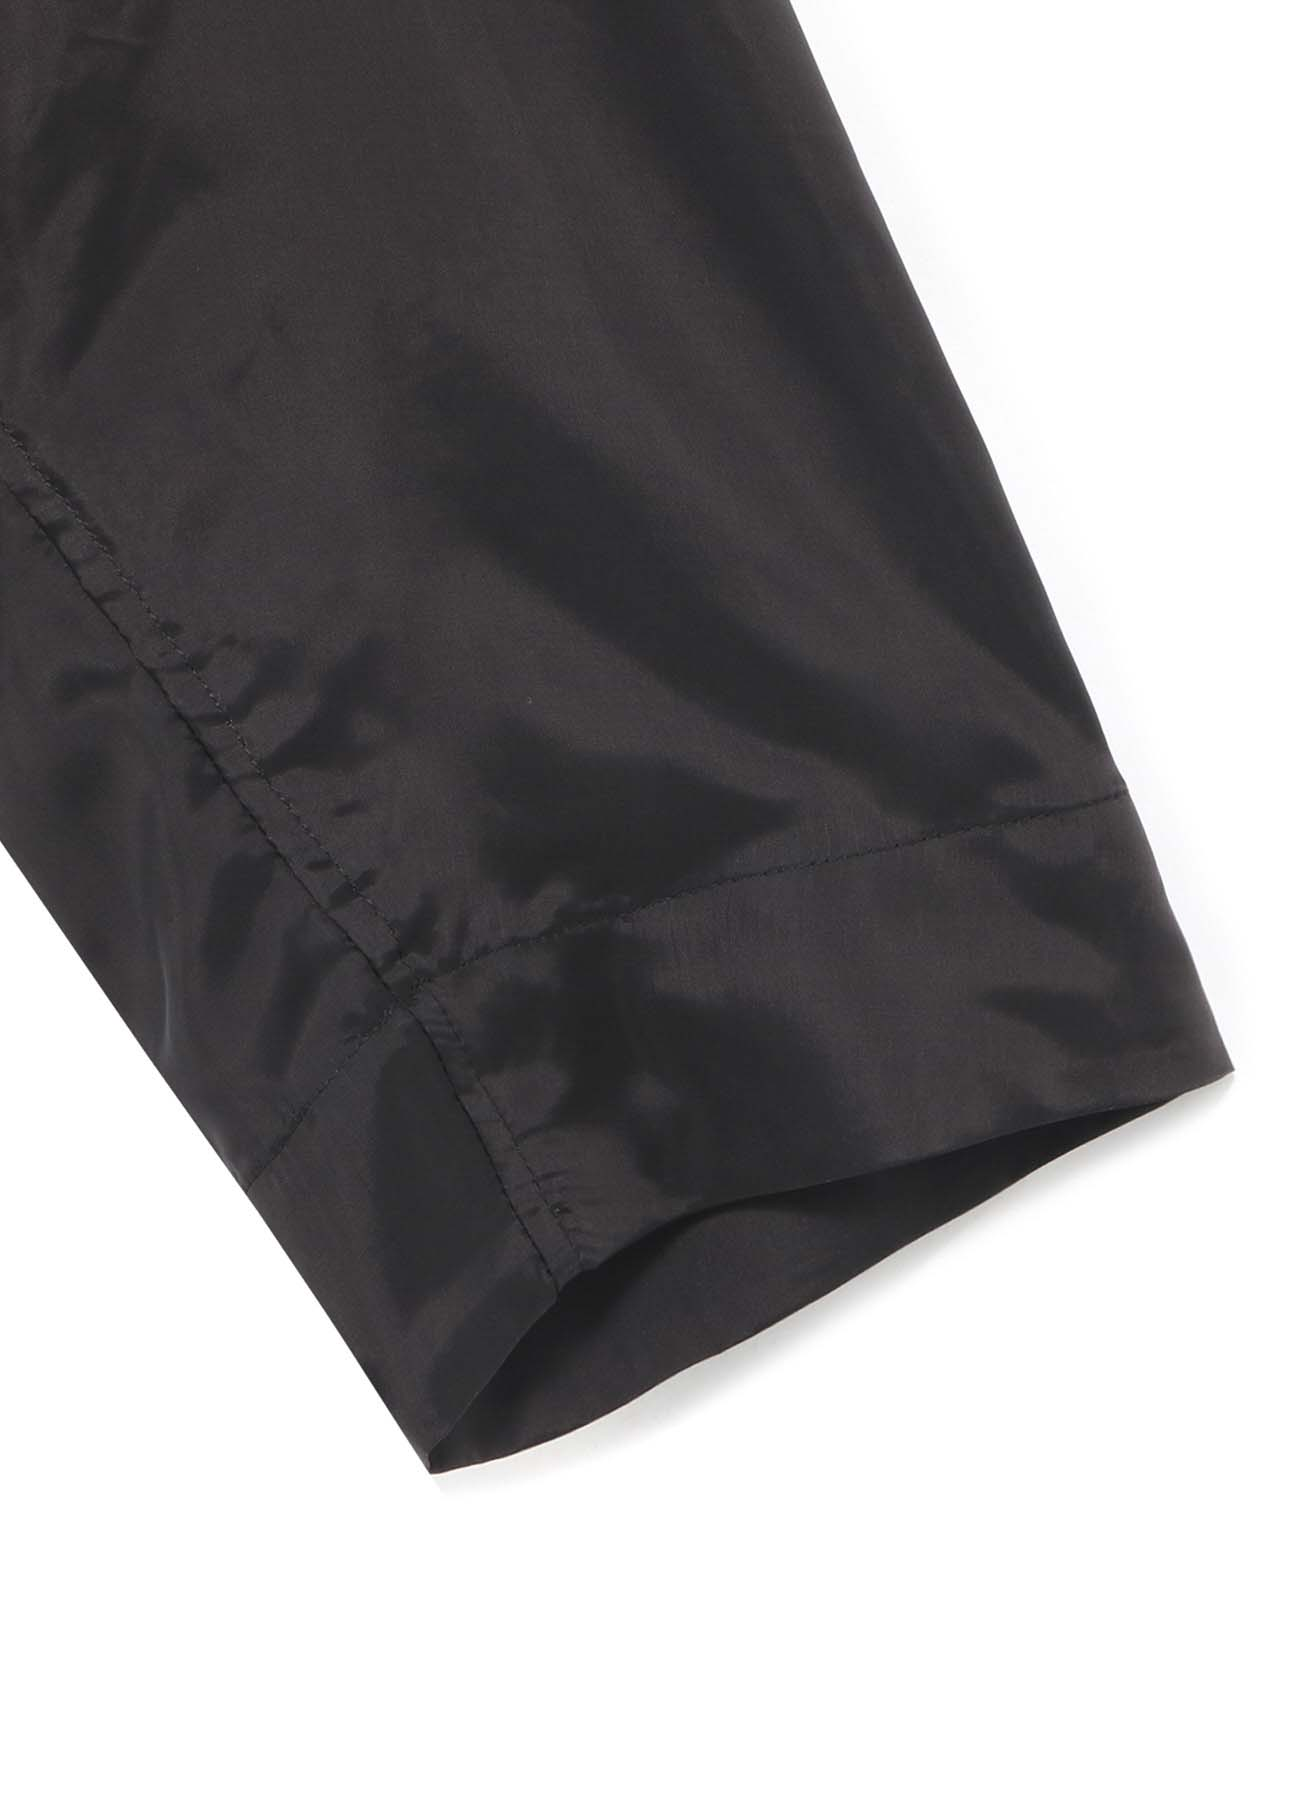 60s Ry/Span Twill/Cu Washer Big Raglan Coverall Jacket